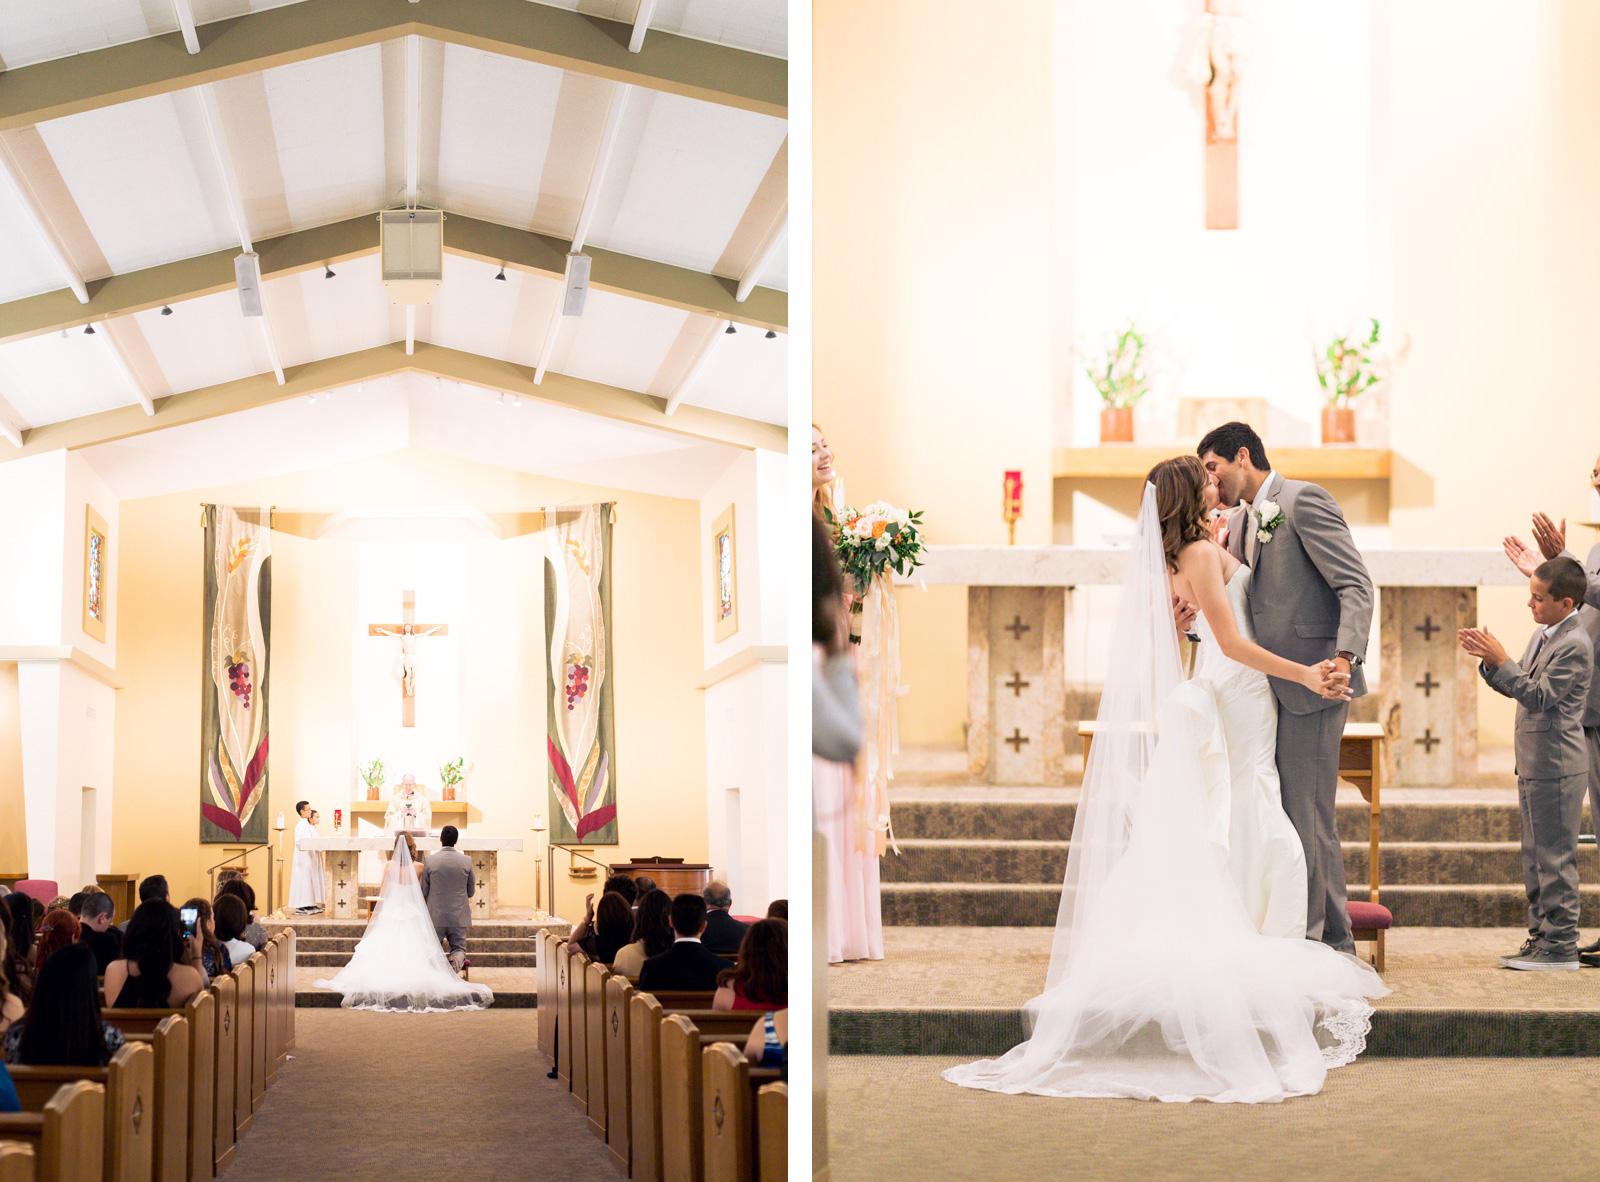 Wedding-Ceremony_04.jpg